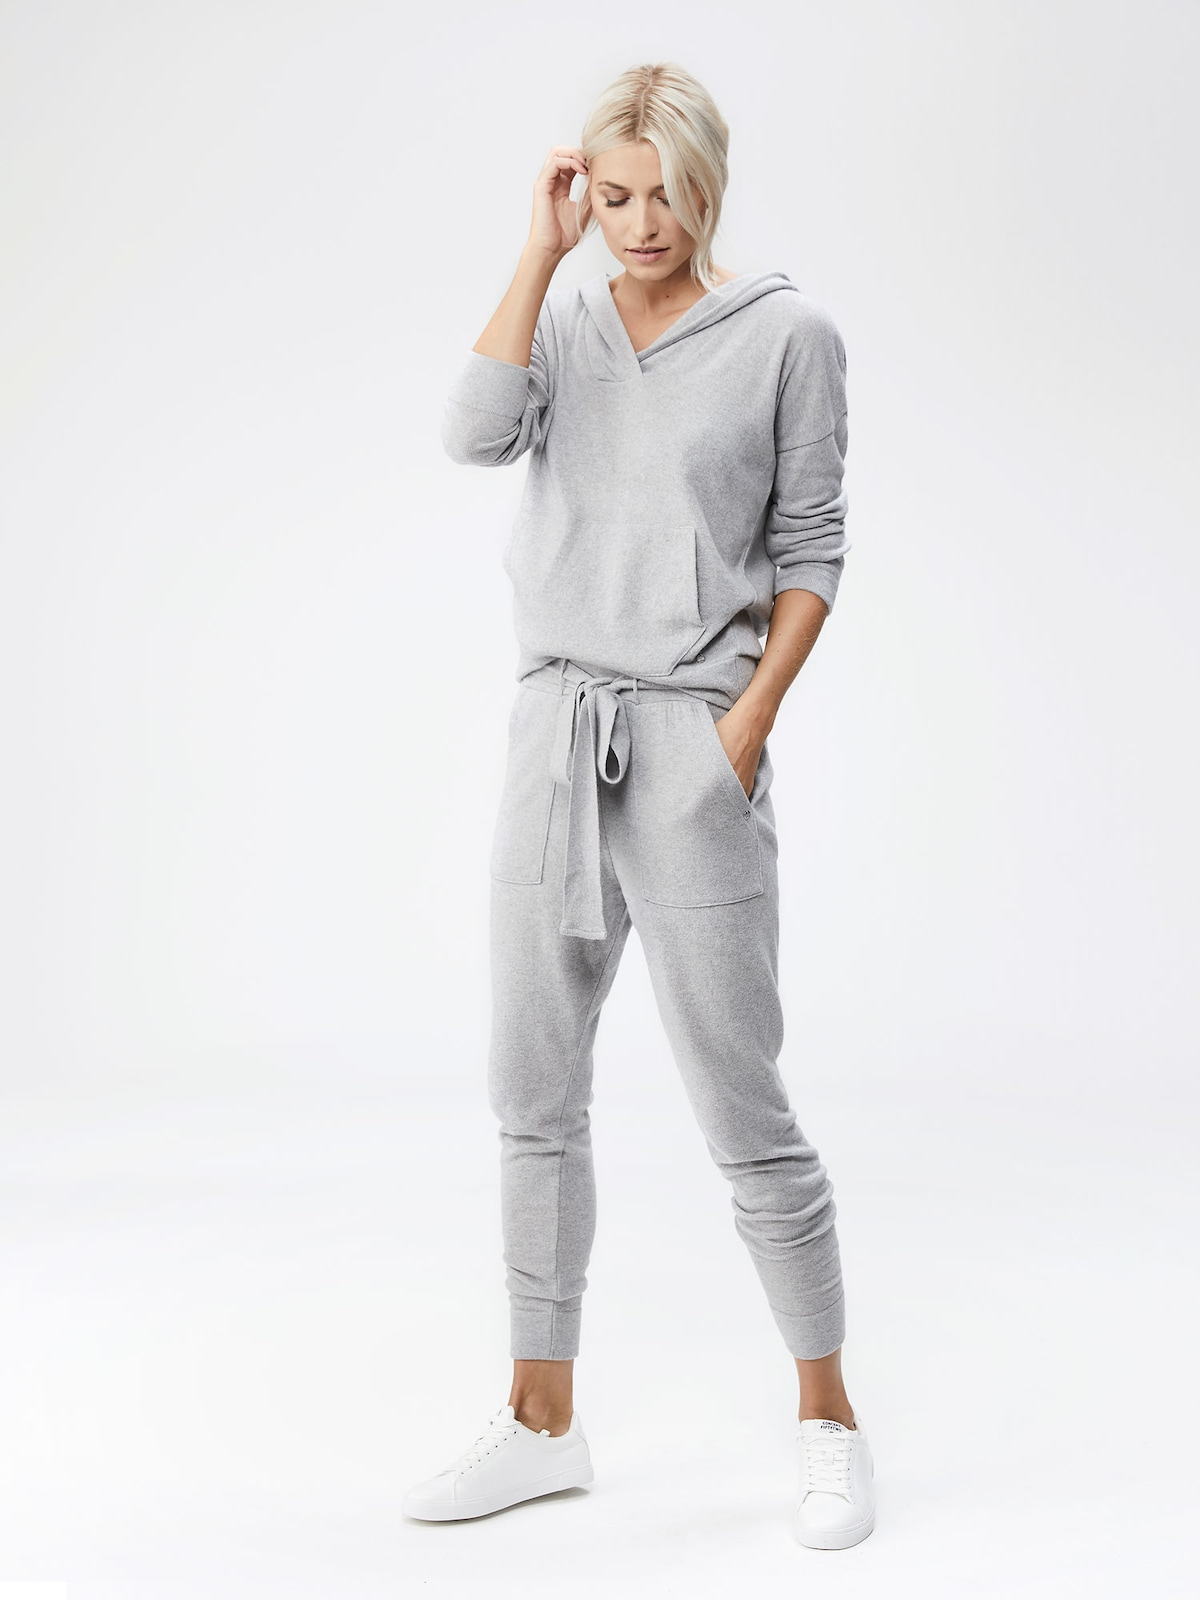 leger-lena-gercke-loungewear-bei-about-you-kaufen